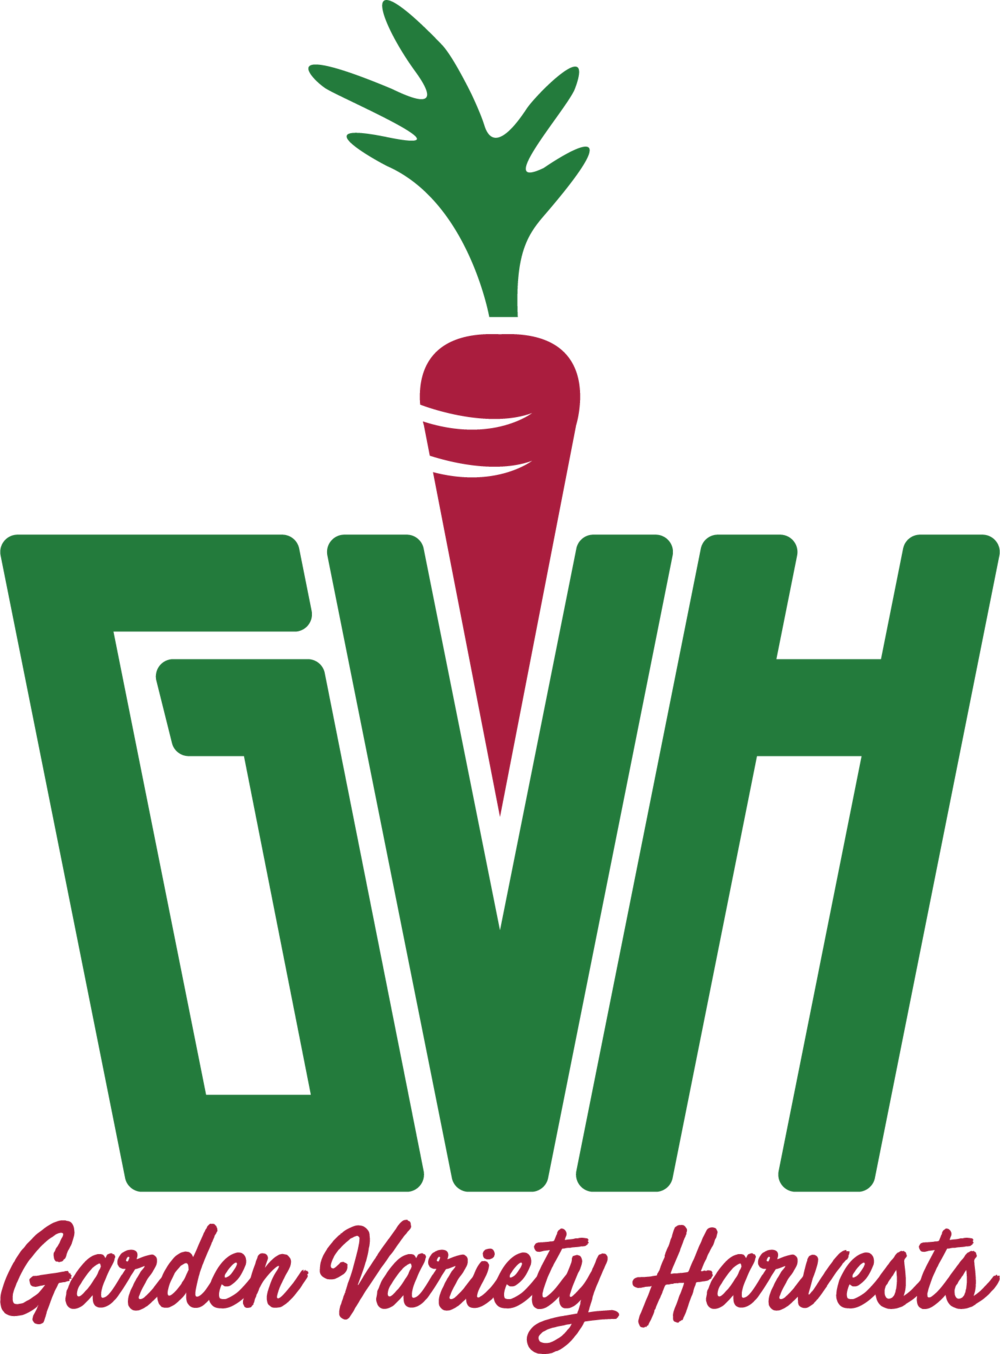 gvh_logo.png